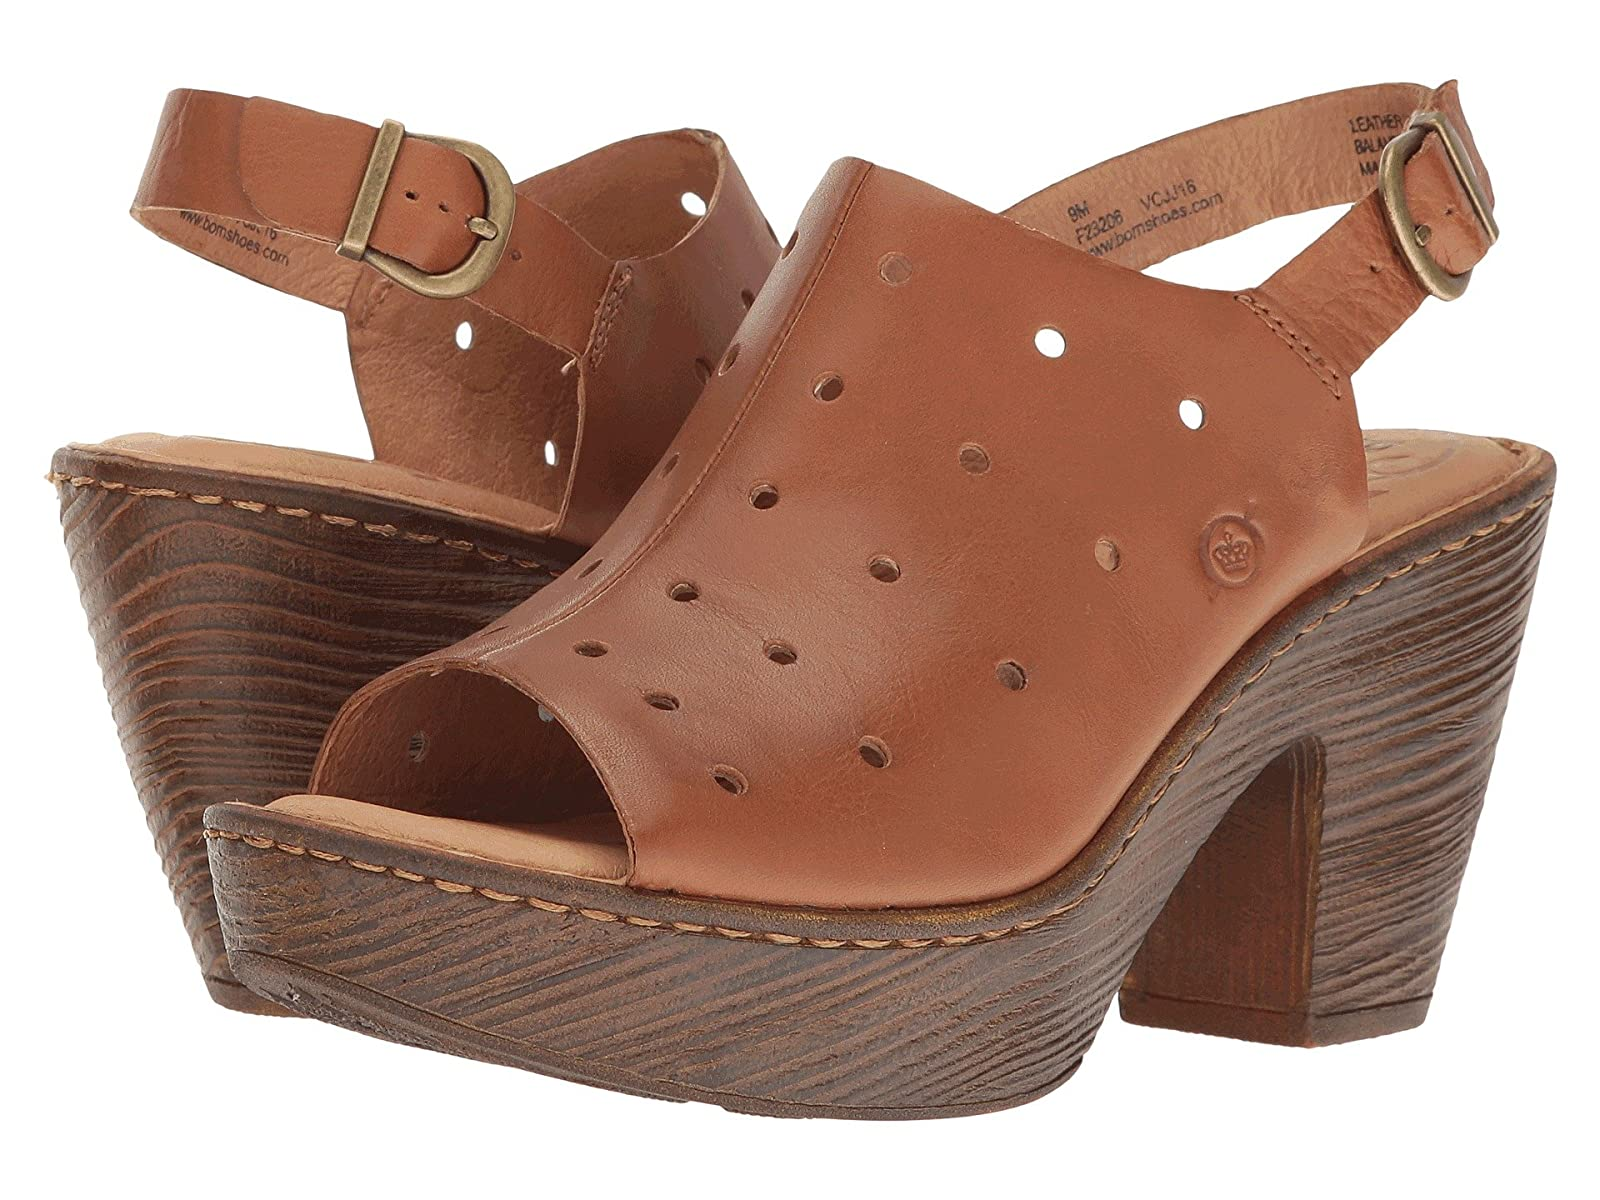 Born GaloaCheap and distinctive eye-catching shoes